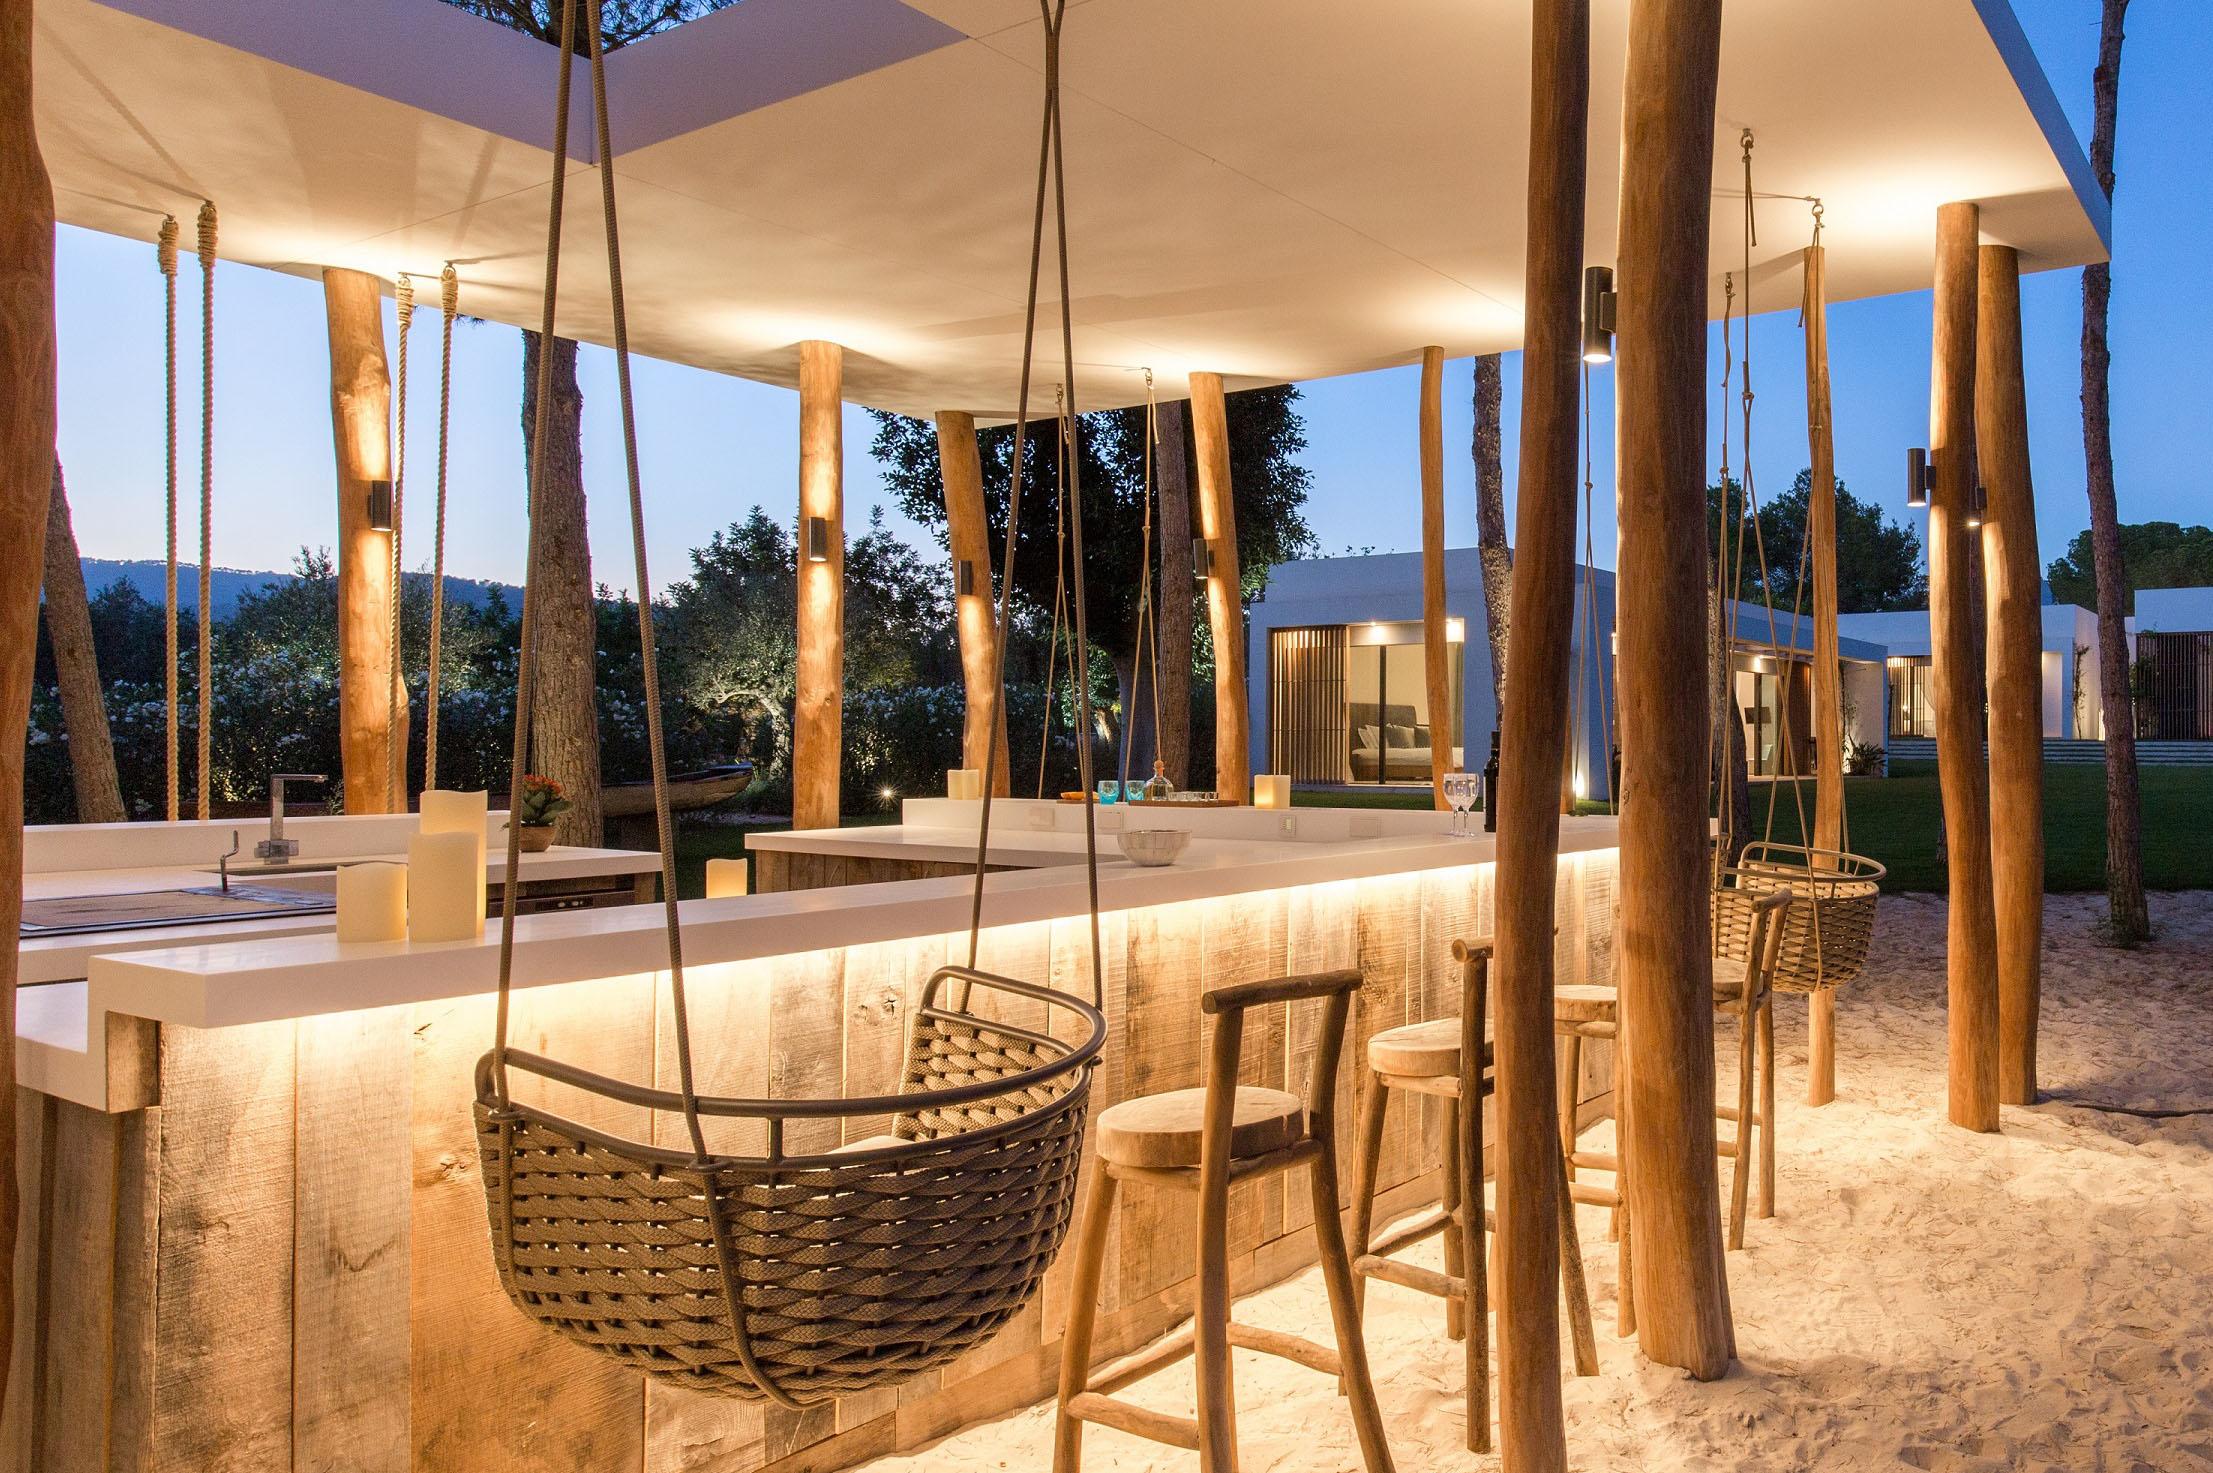 Luxus Ferienhaus Auf Ibiza Mieten - Bonavista Estate